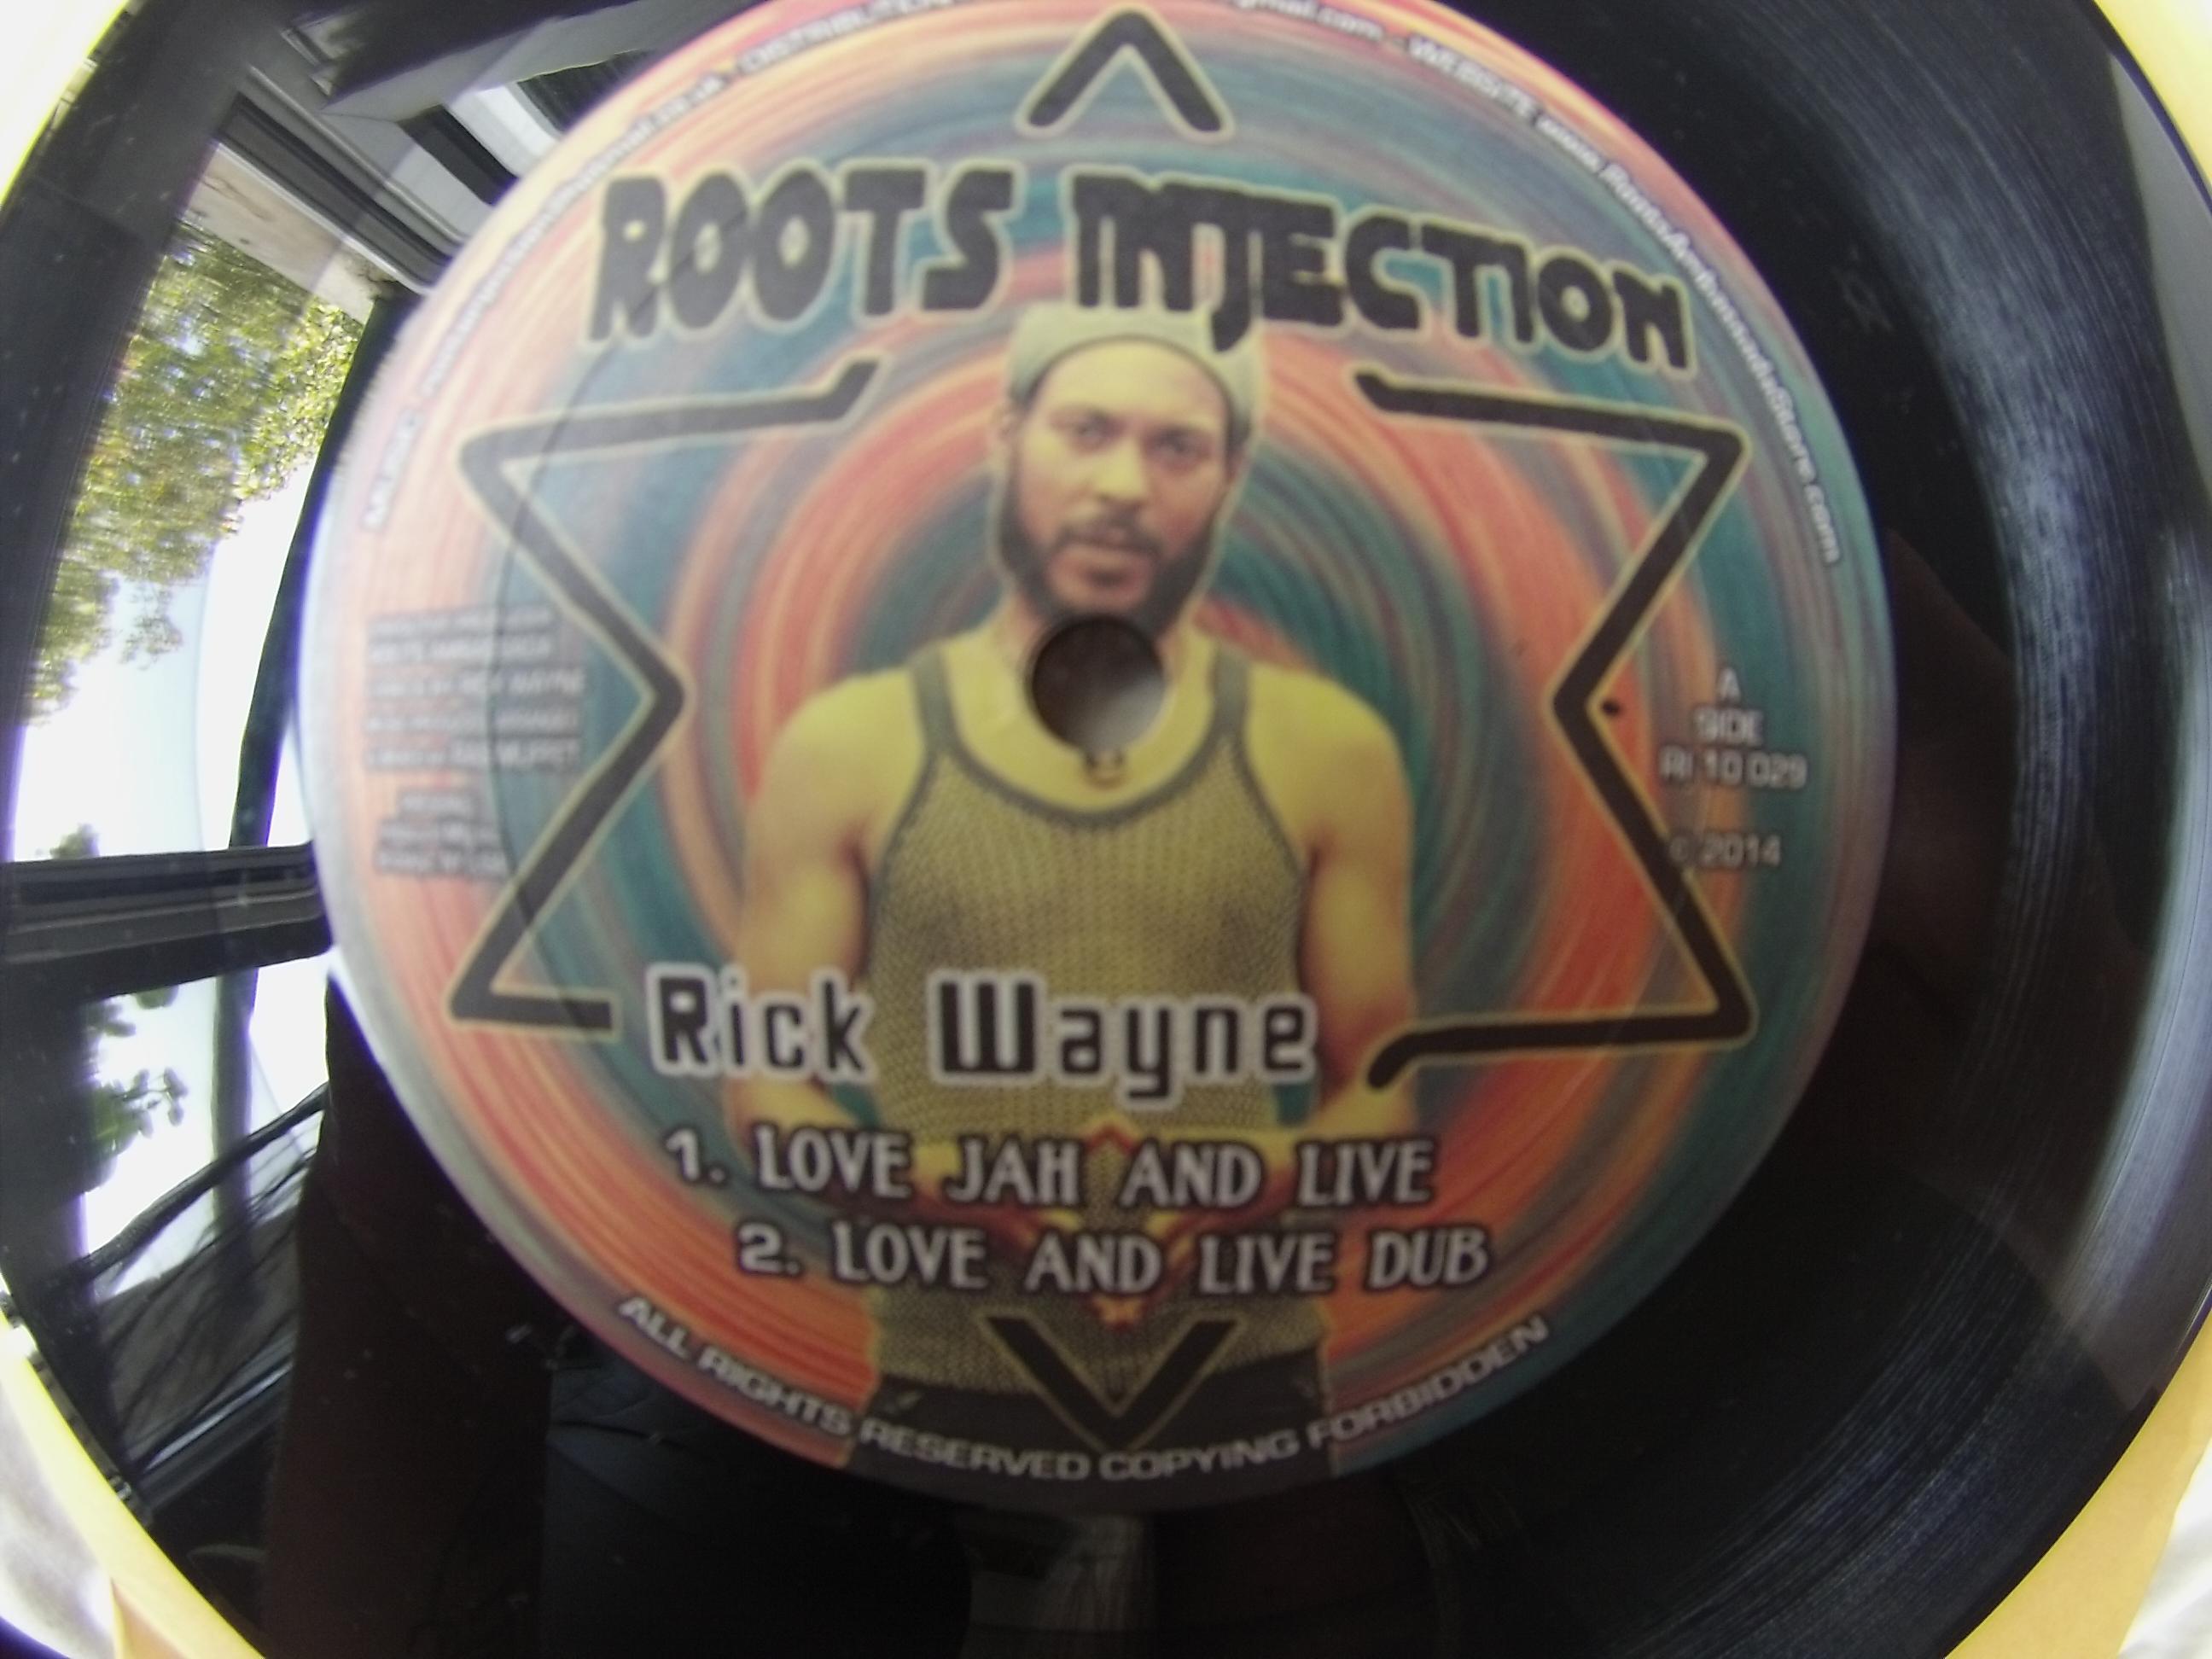 "RICK WAYNE - Love jah and live (Roots injection ) 10"""